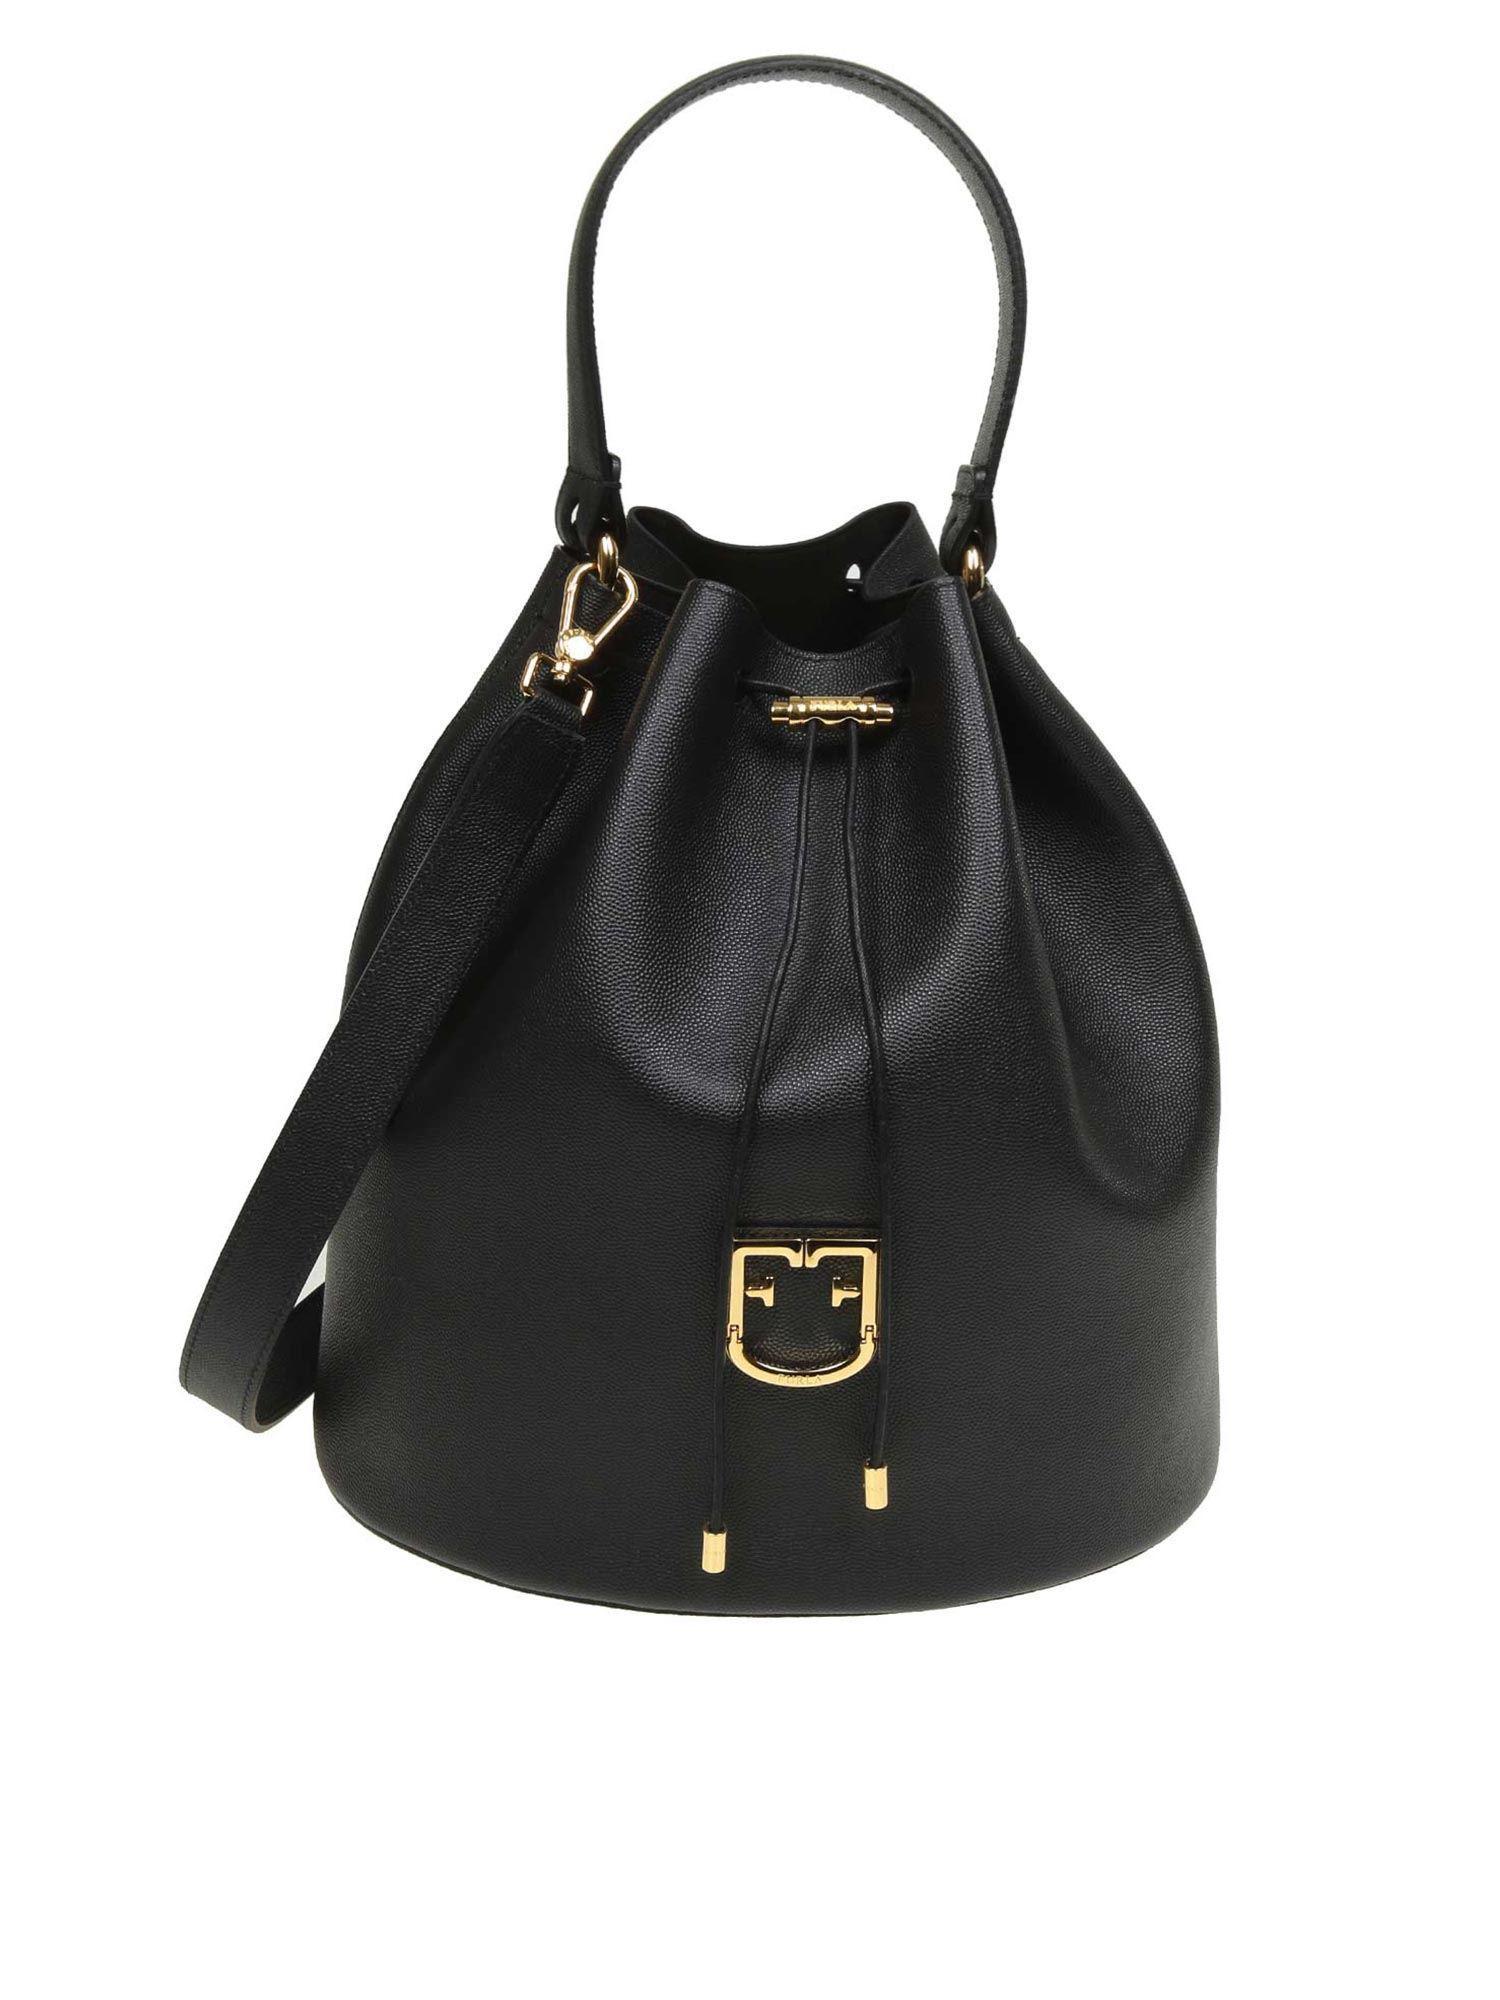 d547b63c0cea Lyst - Furla Corona M Bucket Bag In Black Leather in Black